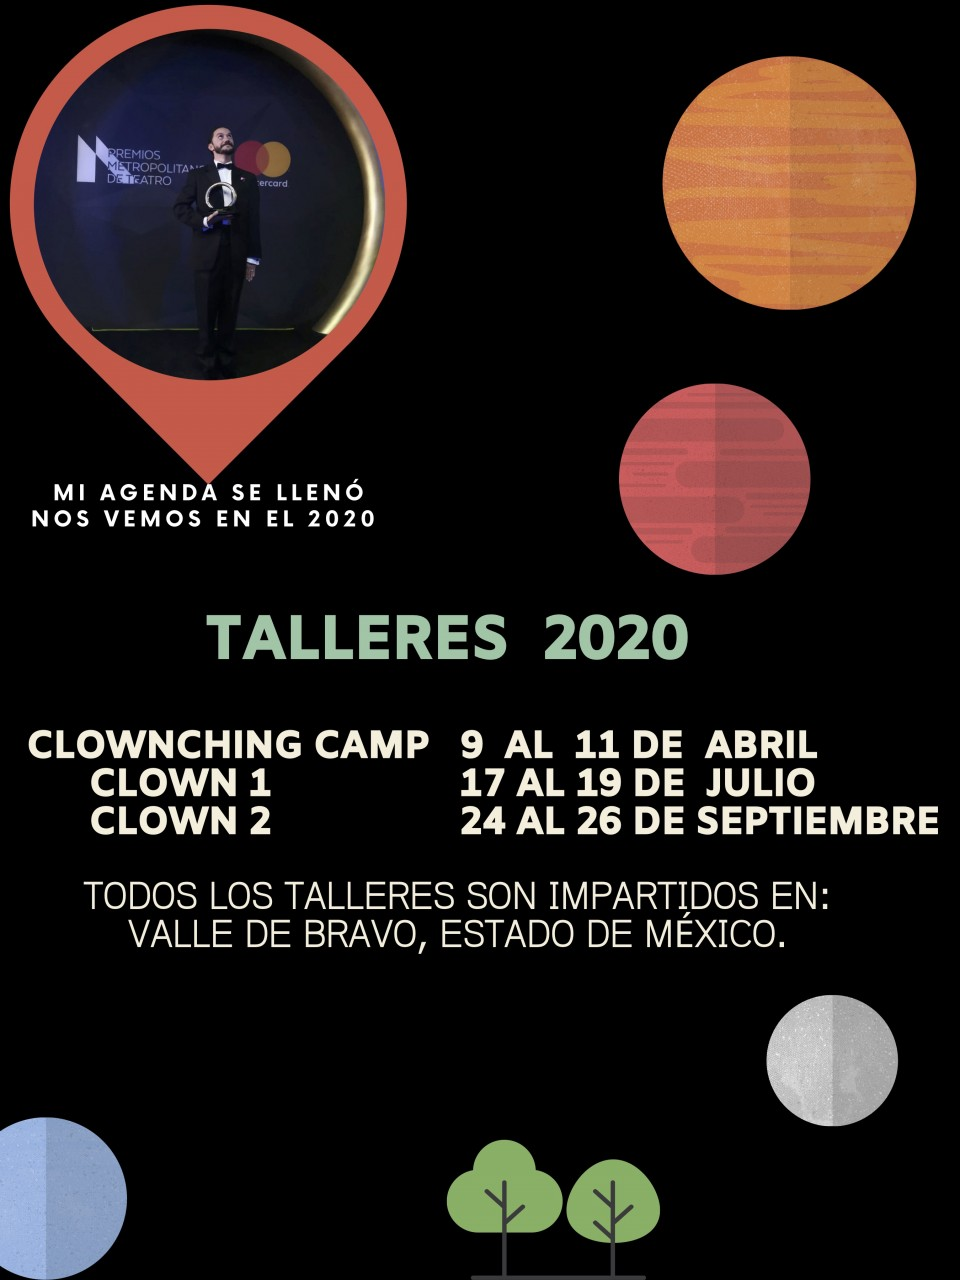 Talleres 2020